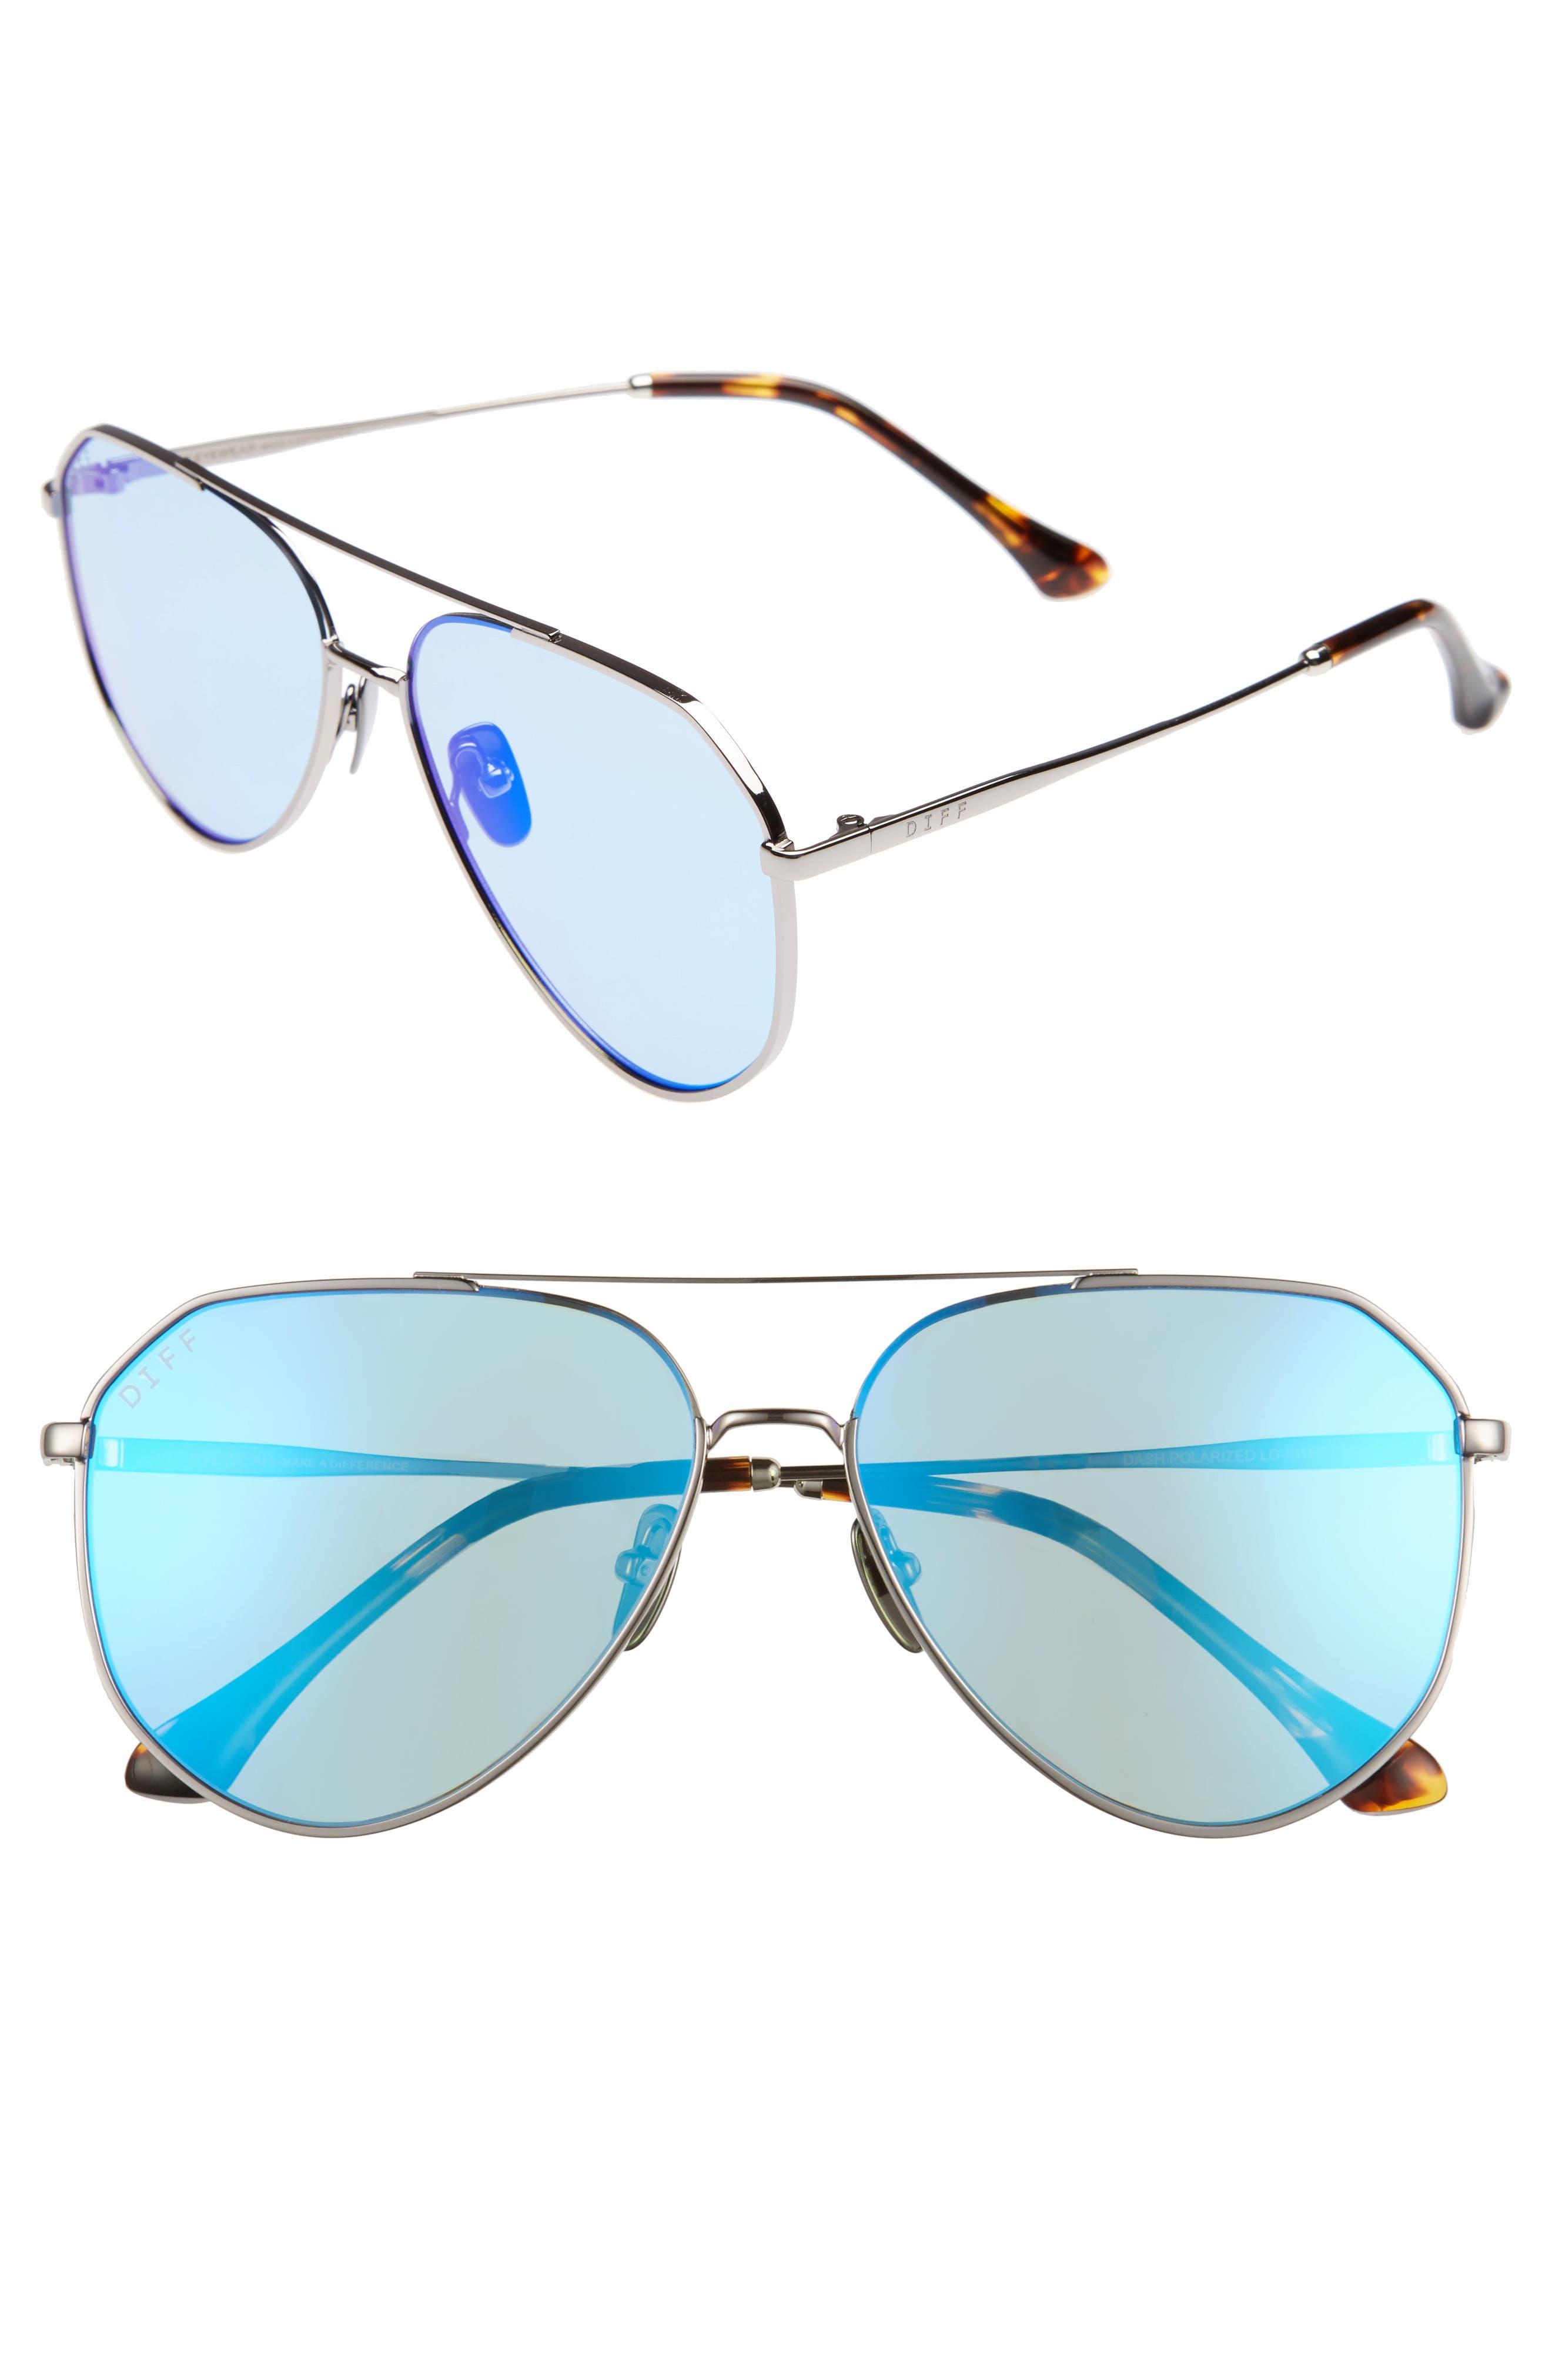 Dash 61mm Polarized Aviator Sunglasses,                         Main,                         color, Gunmetal/ Ice Blue